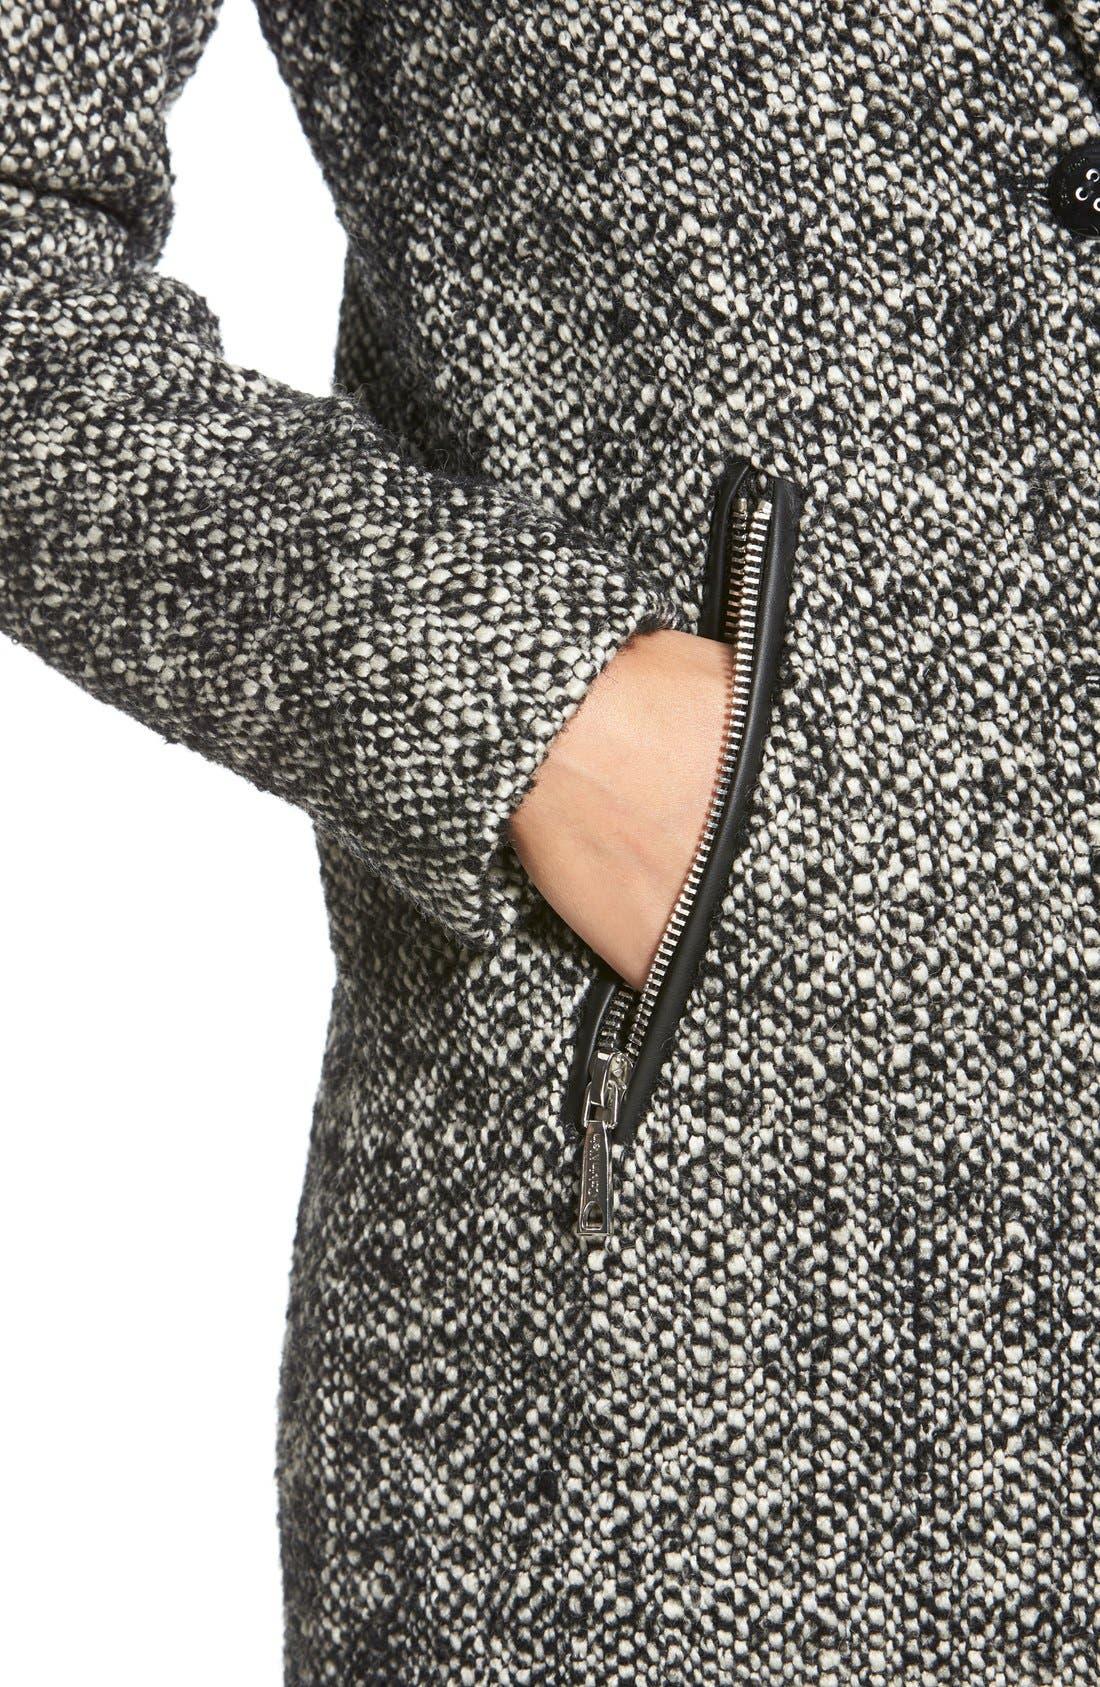 Tweed Walking Coat,                             Alternate thumbnail 2, color,                             081